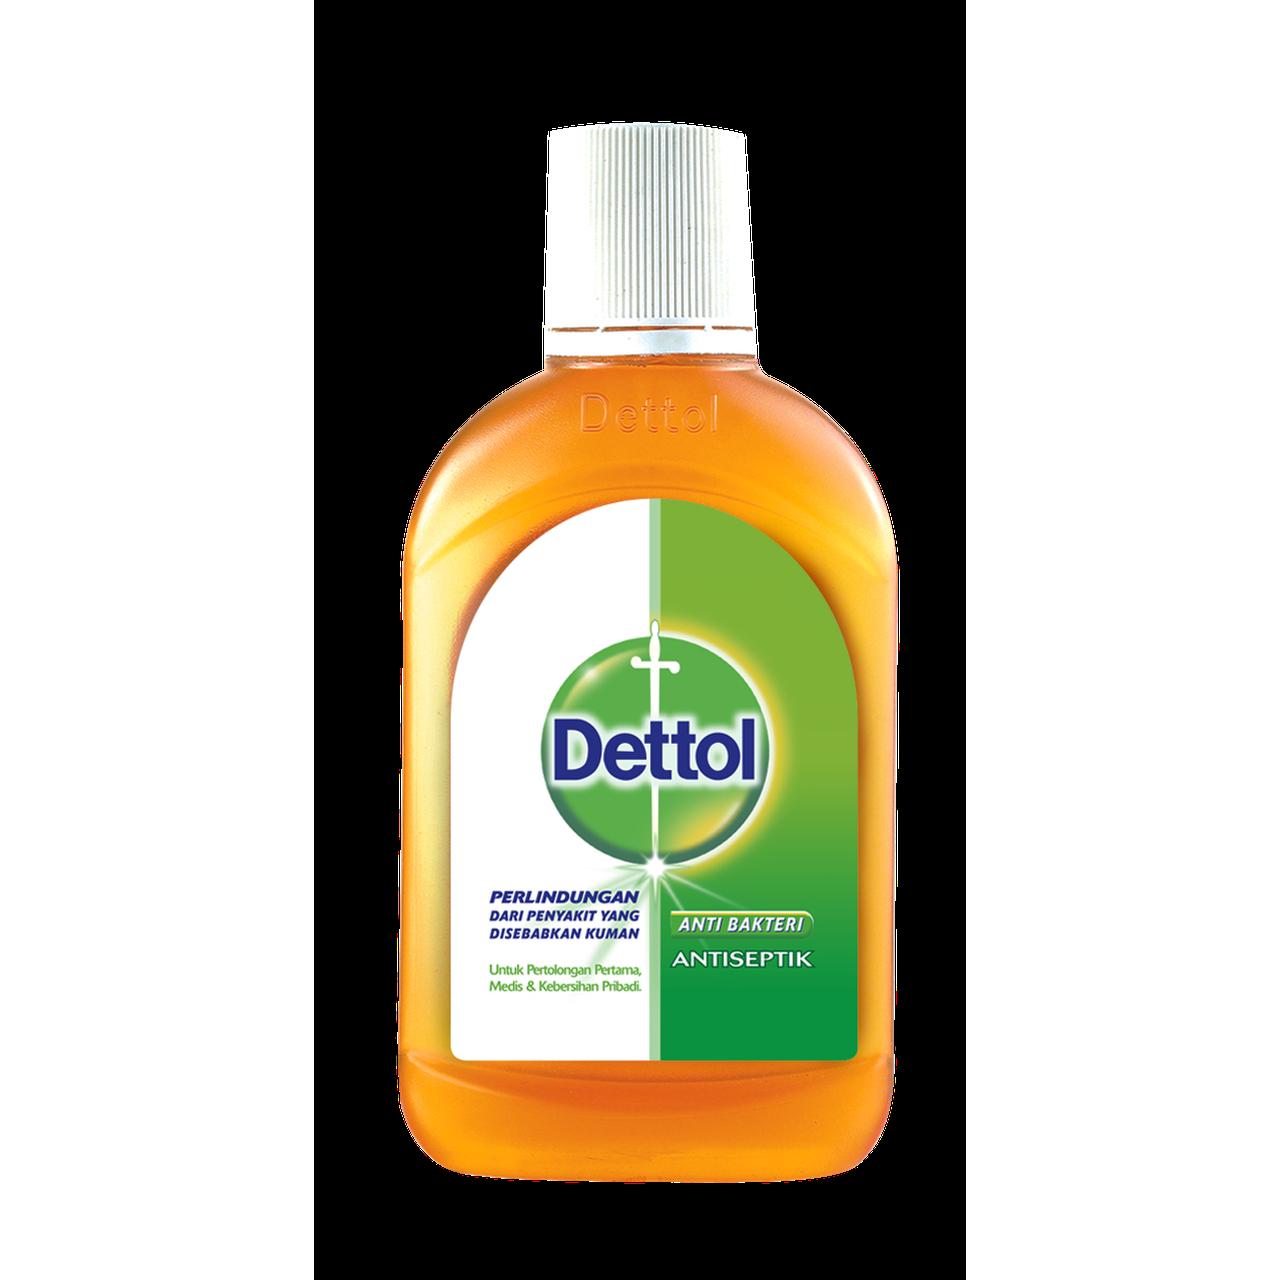 Dettol Anti Bakteri Antiseptik Cair (100ml)